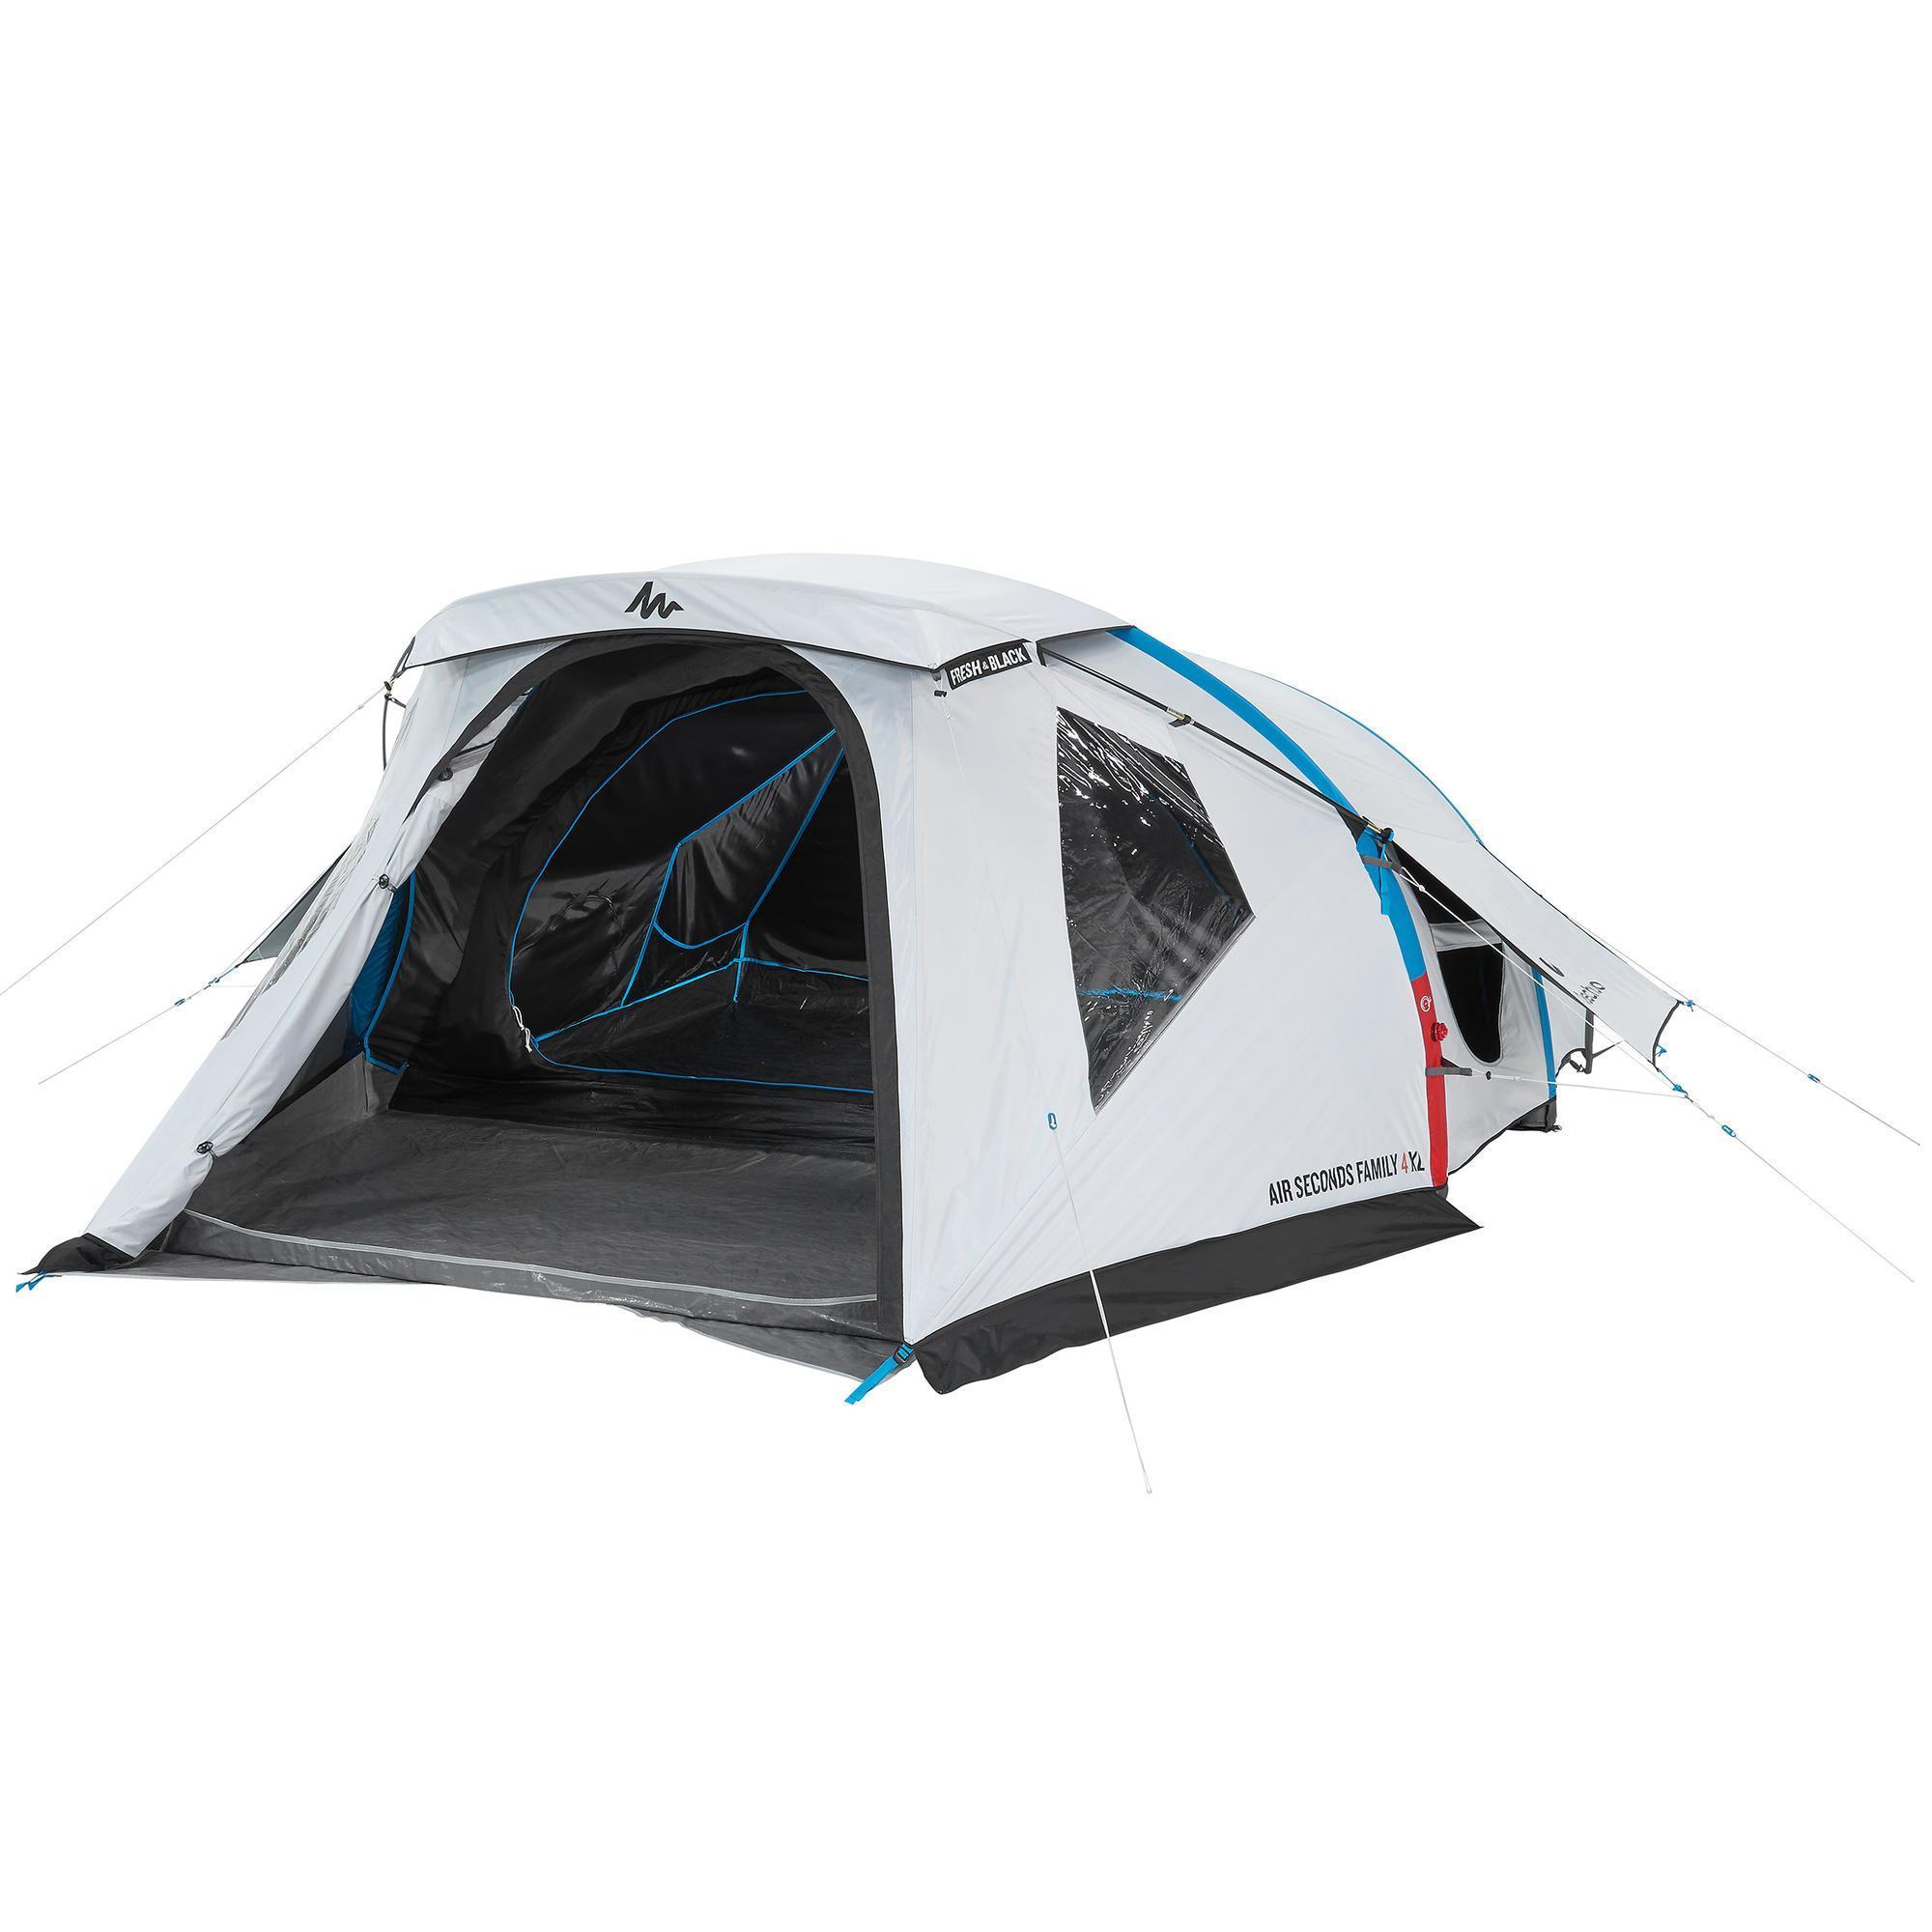 tente quechua 1 place tente quechua xl air with tente quechua 1 place affordable tente places. Black Bedroom Furniture Sets. Home Design Ideas